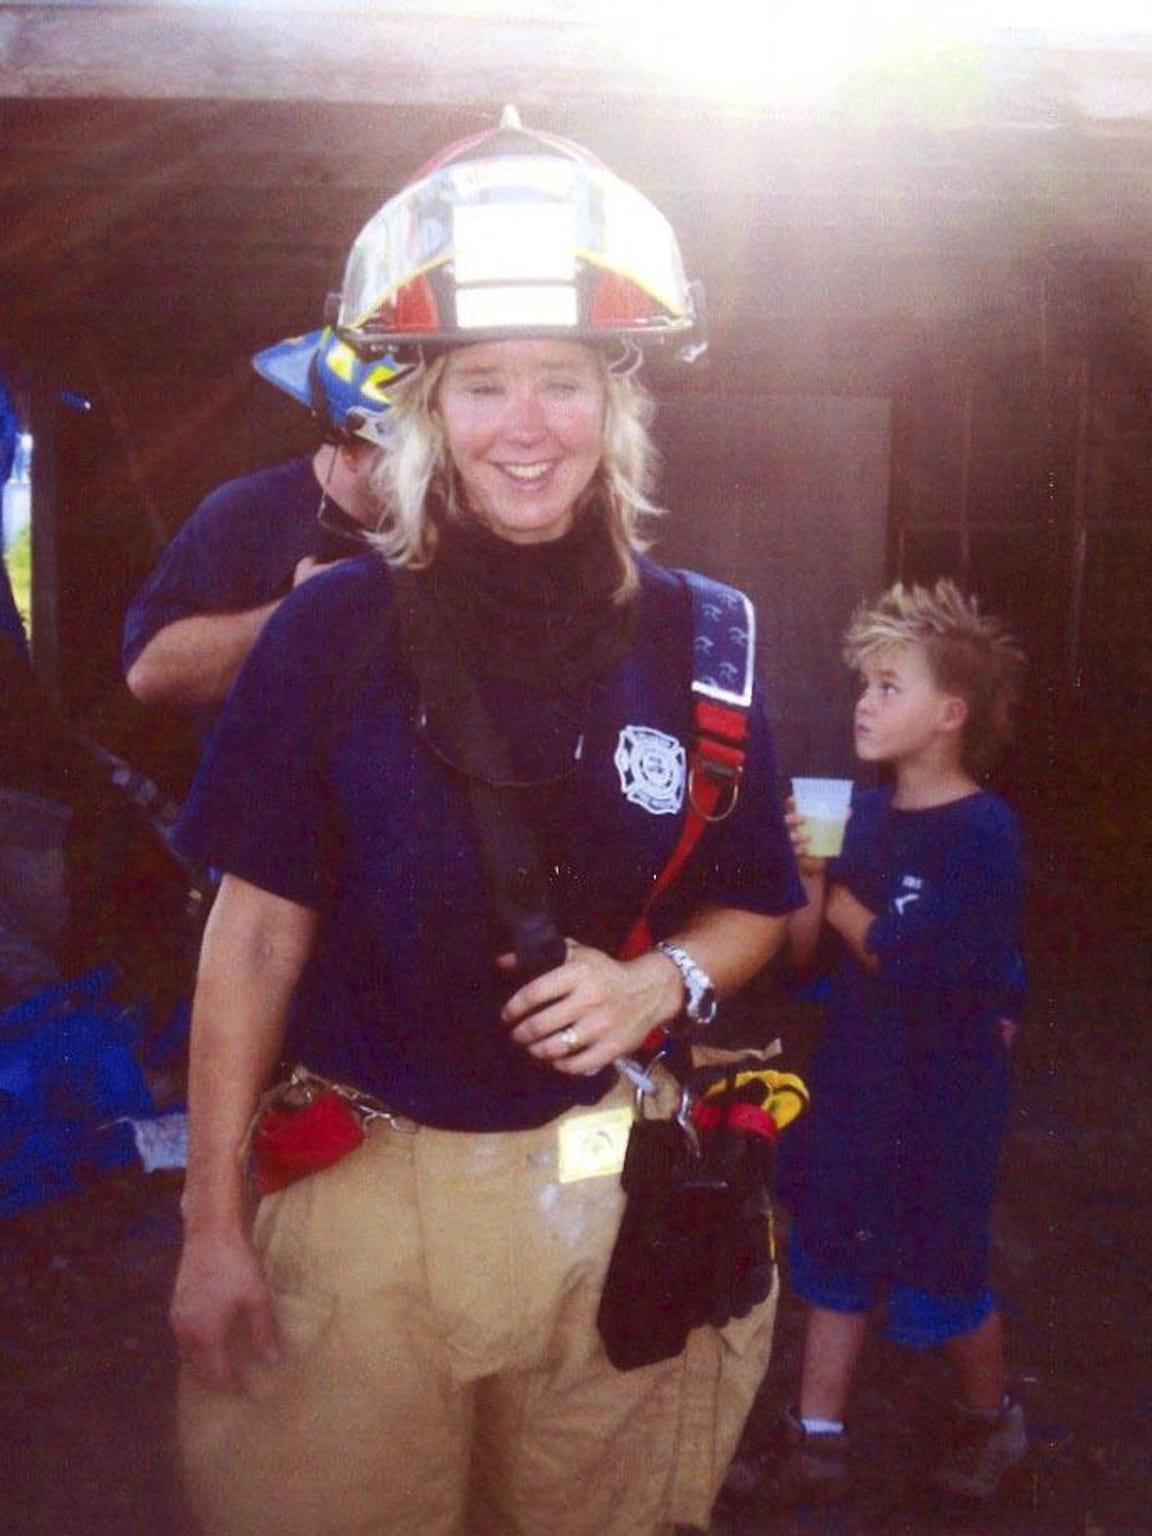 Undated photoBrandy Hall, missing firefighter